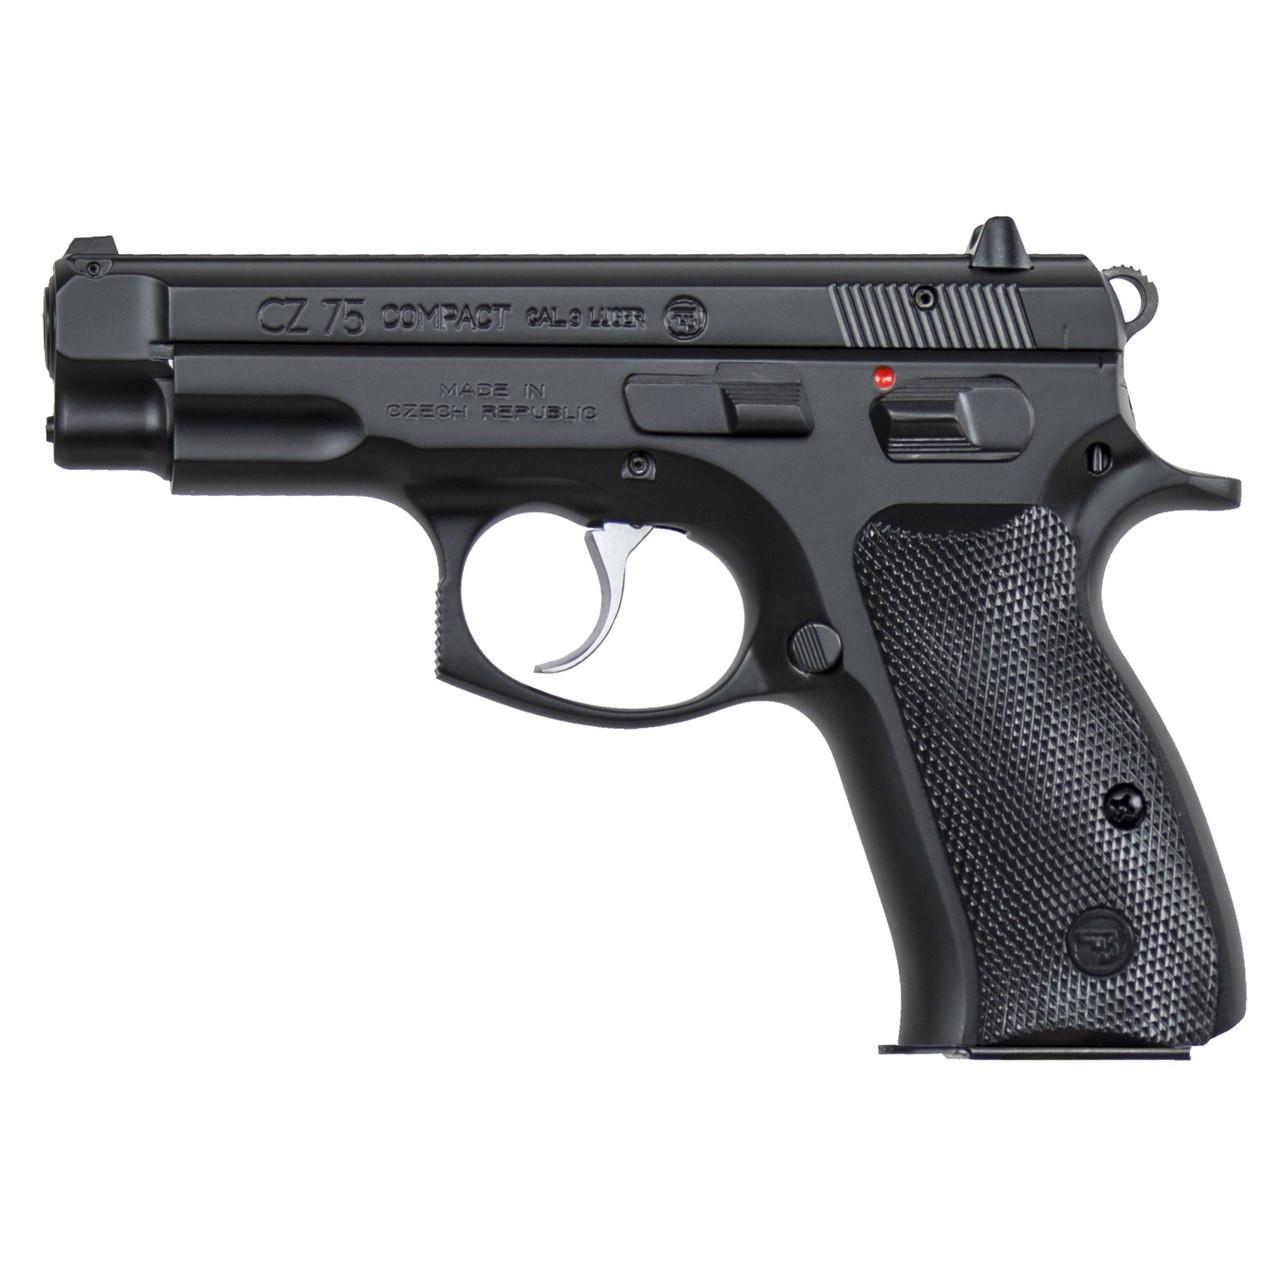 CZ 75 Compact CALIFORNIA LEGAL - 9mm